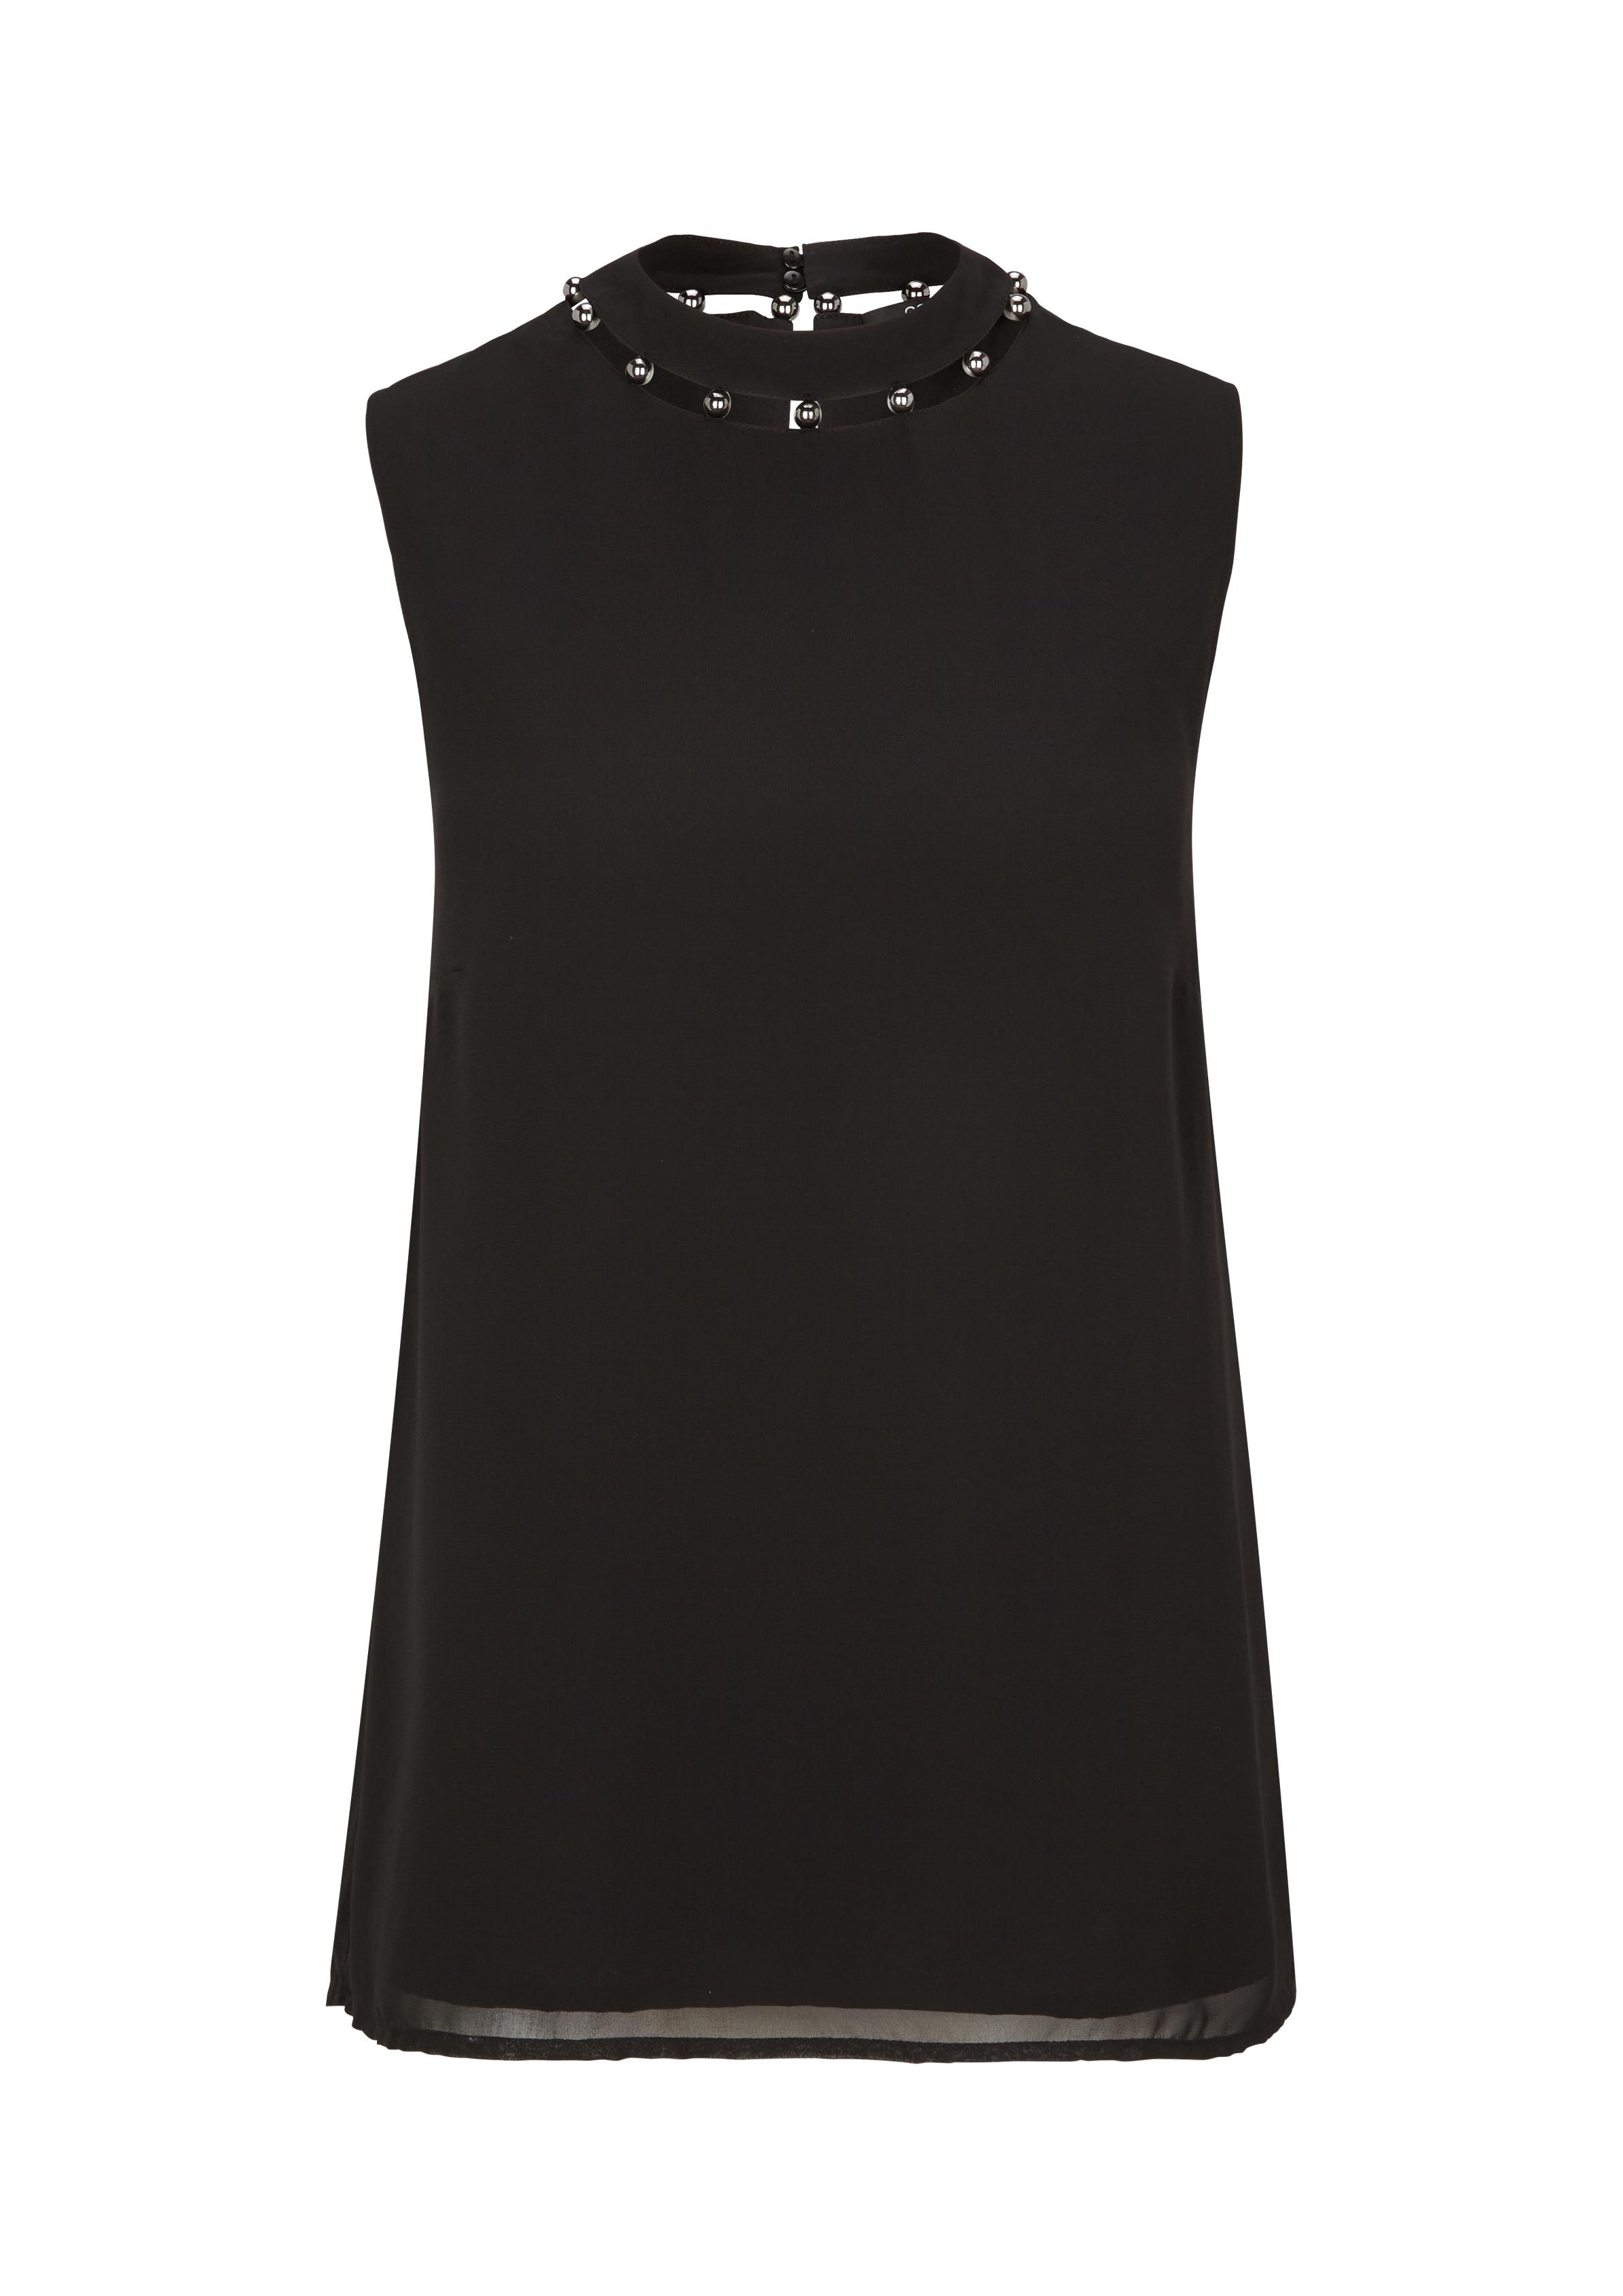 Blusentop | Bekleidung > Tops | Grau/schwarz | 100% polyester| futter: 100% polyester | comma